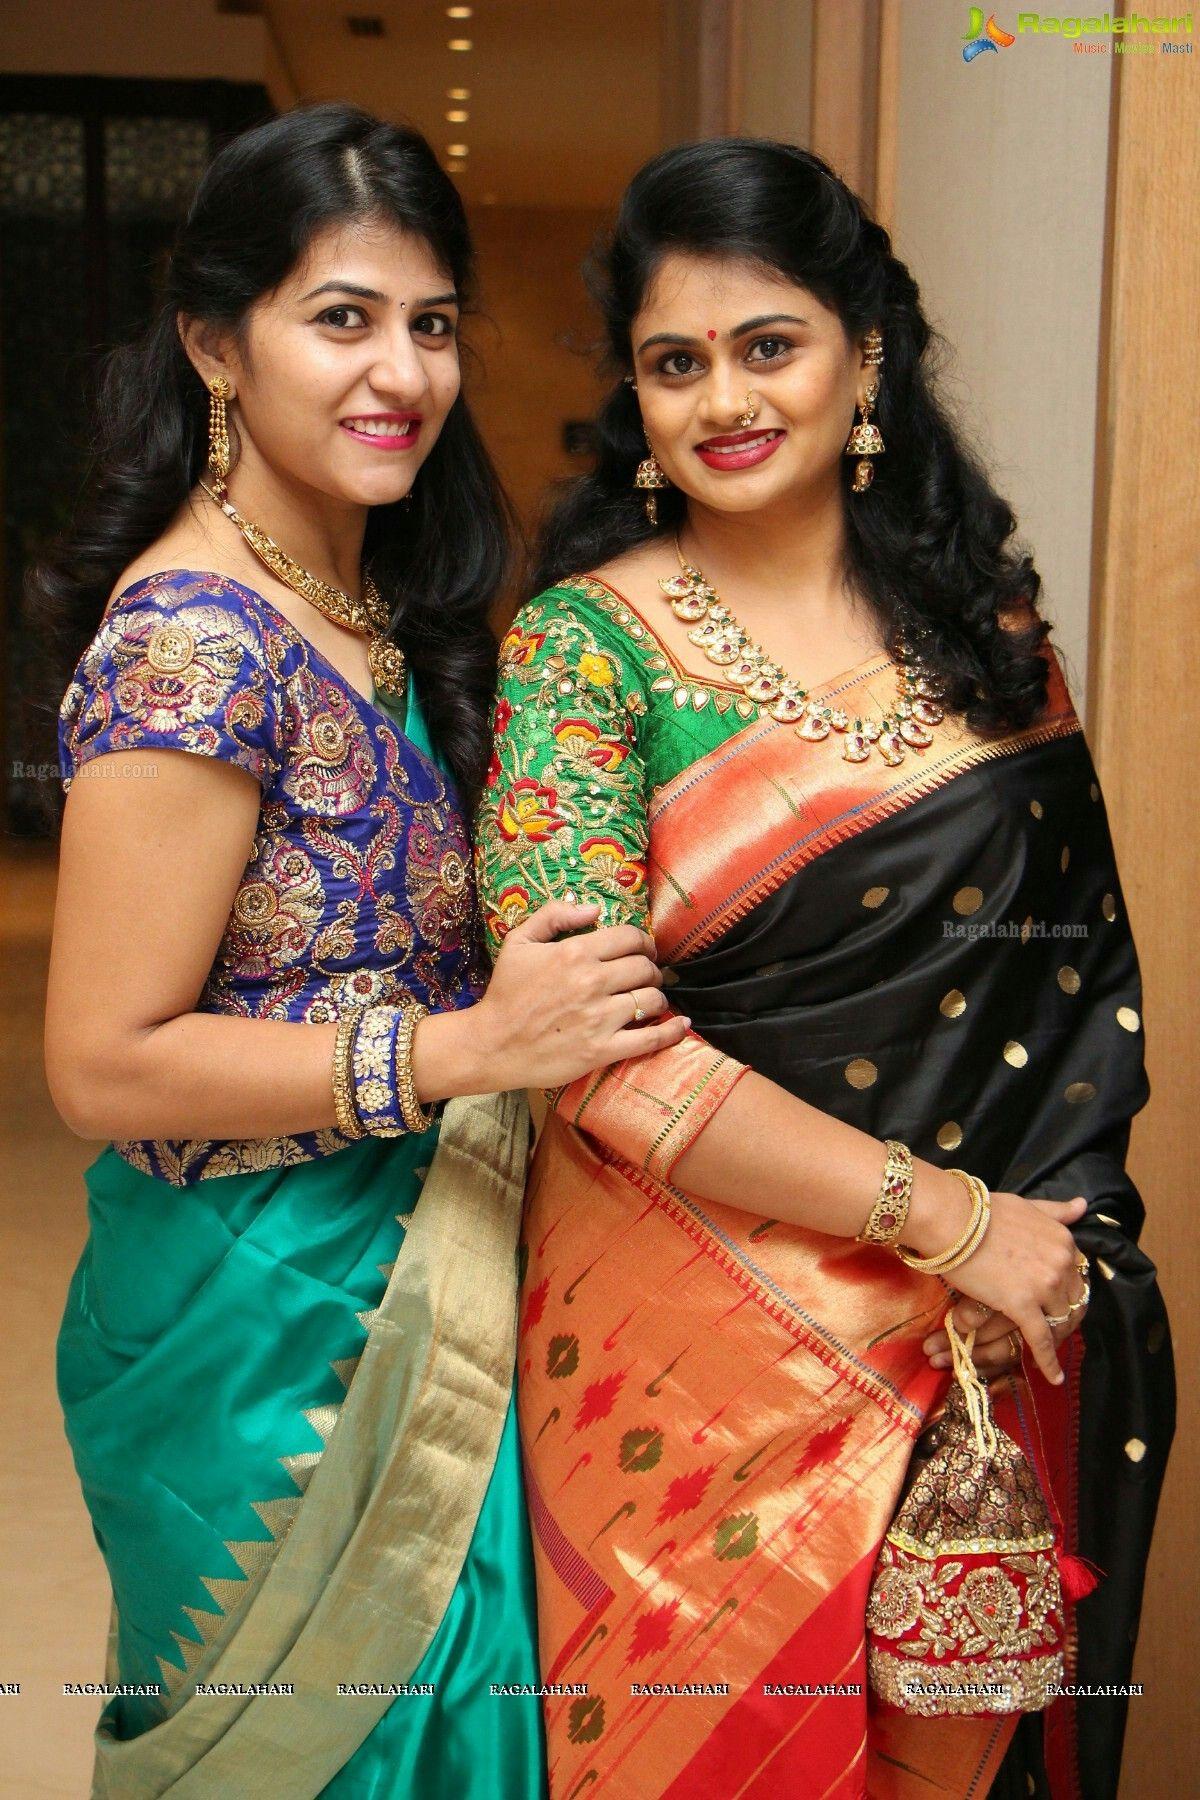 Paithani Sarees Blouse Design Models Saree Blouse Designs